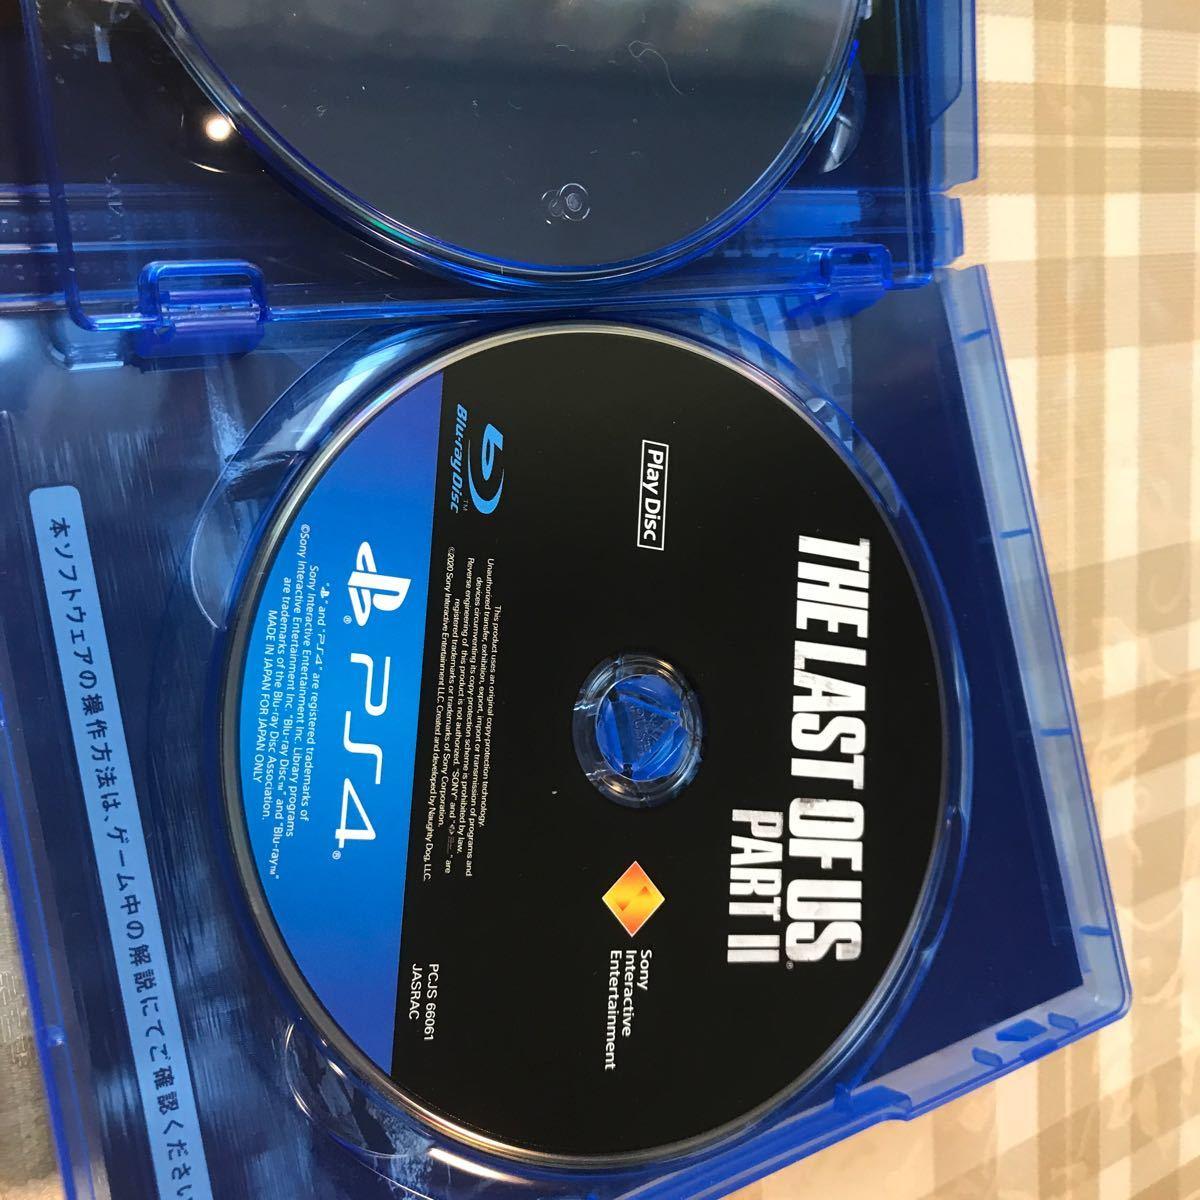 【PS4】 The Last of Us Part II プロダクトコード未使用